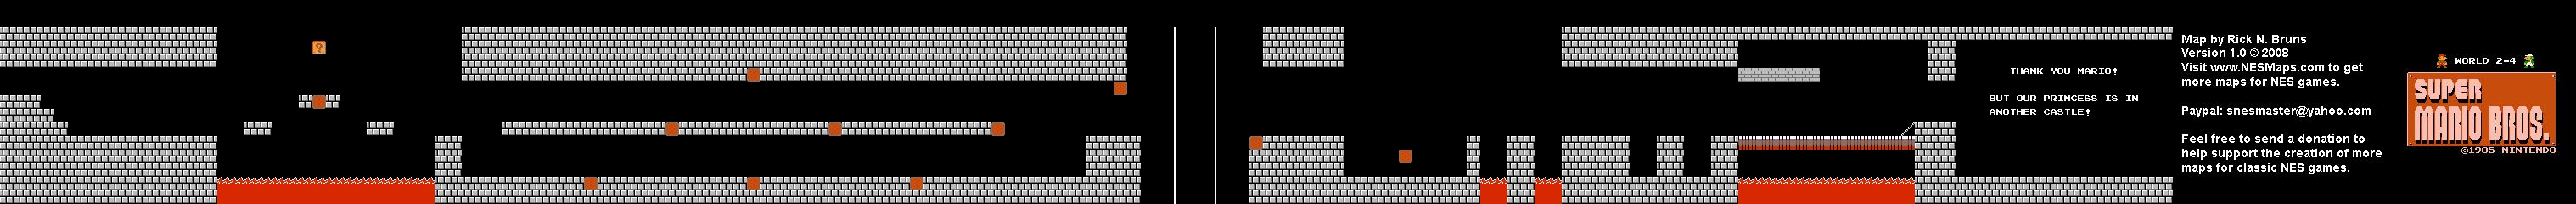 Super Mario Brothers - World 2-4 Nintendo NES Background ...